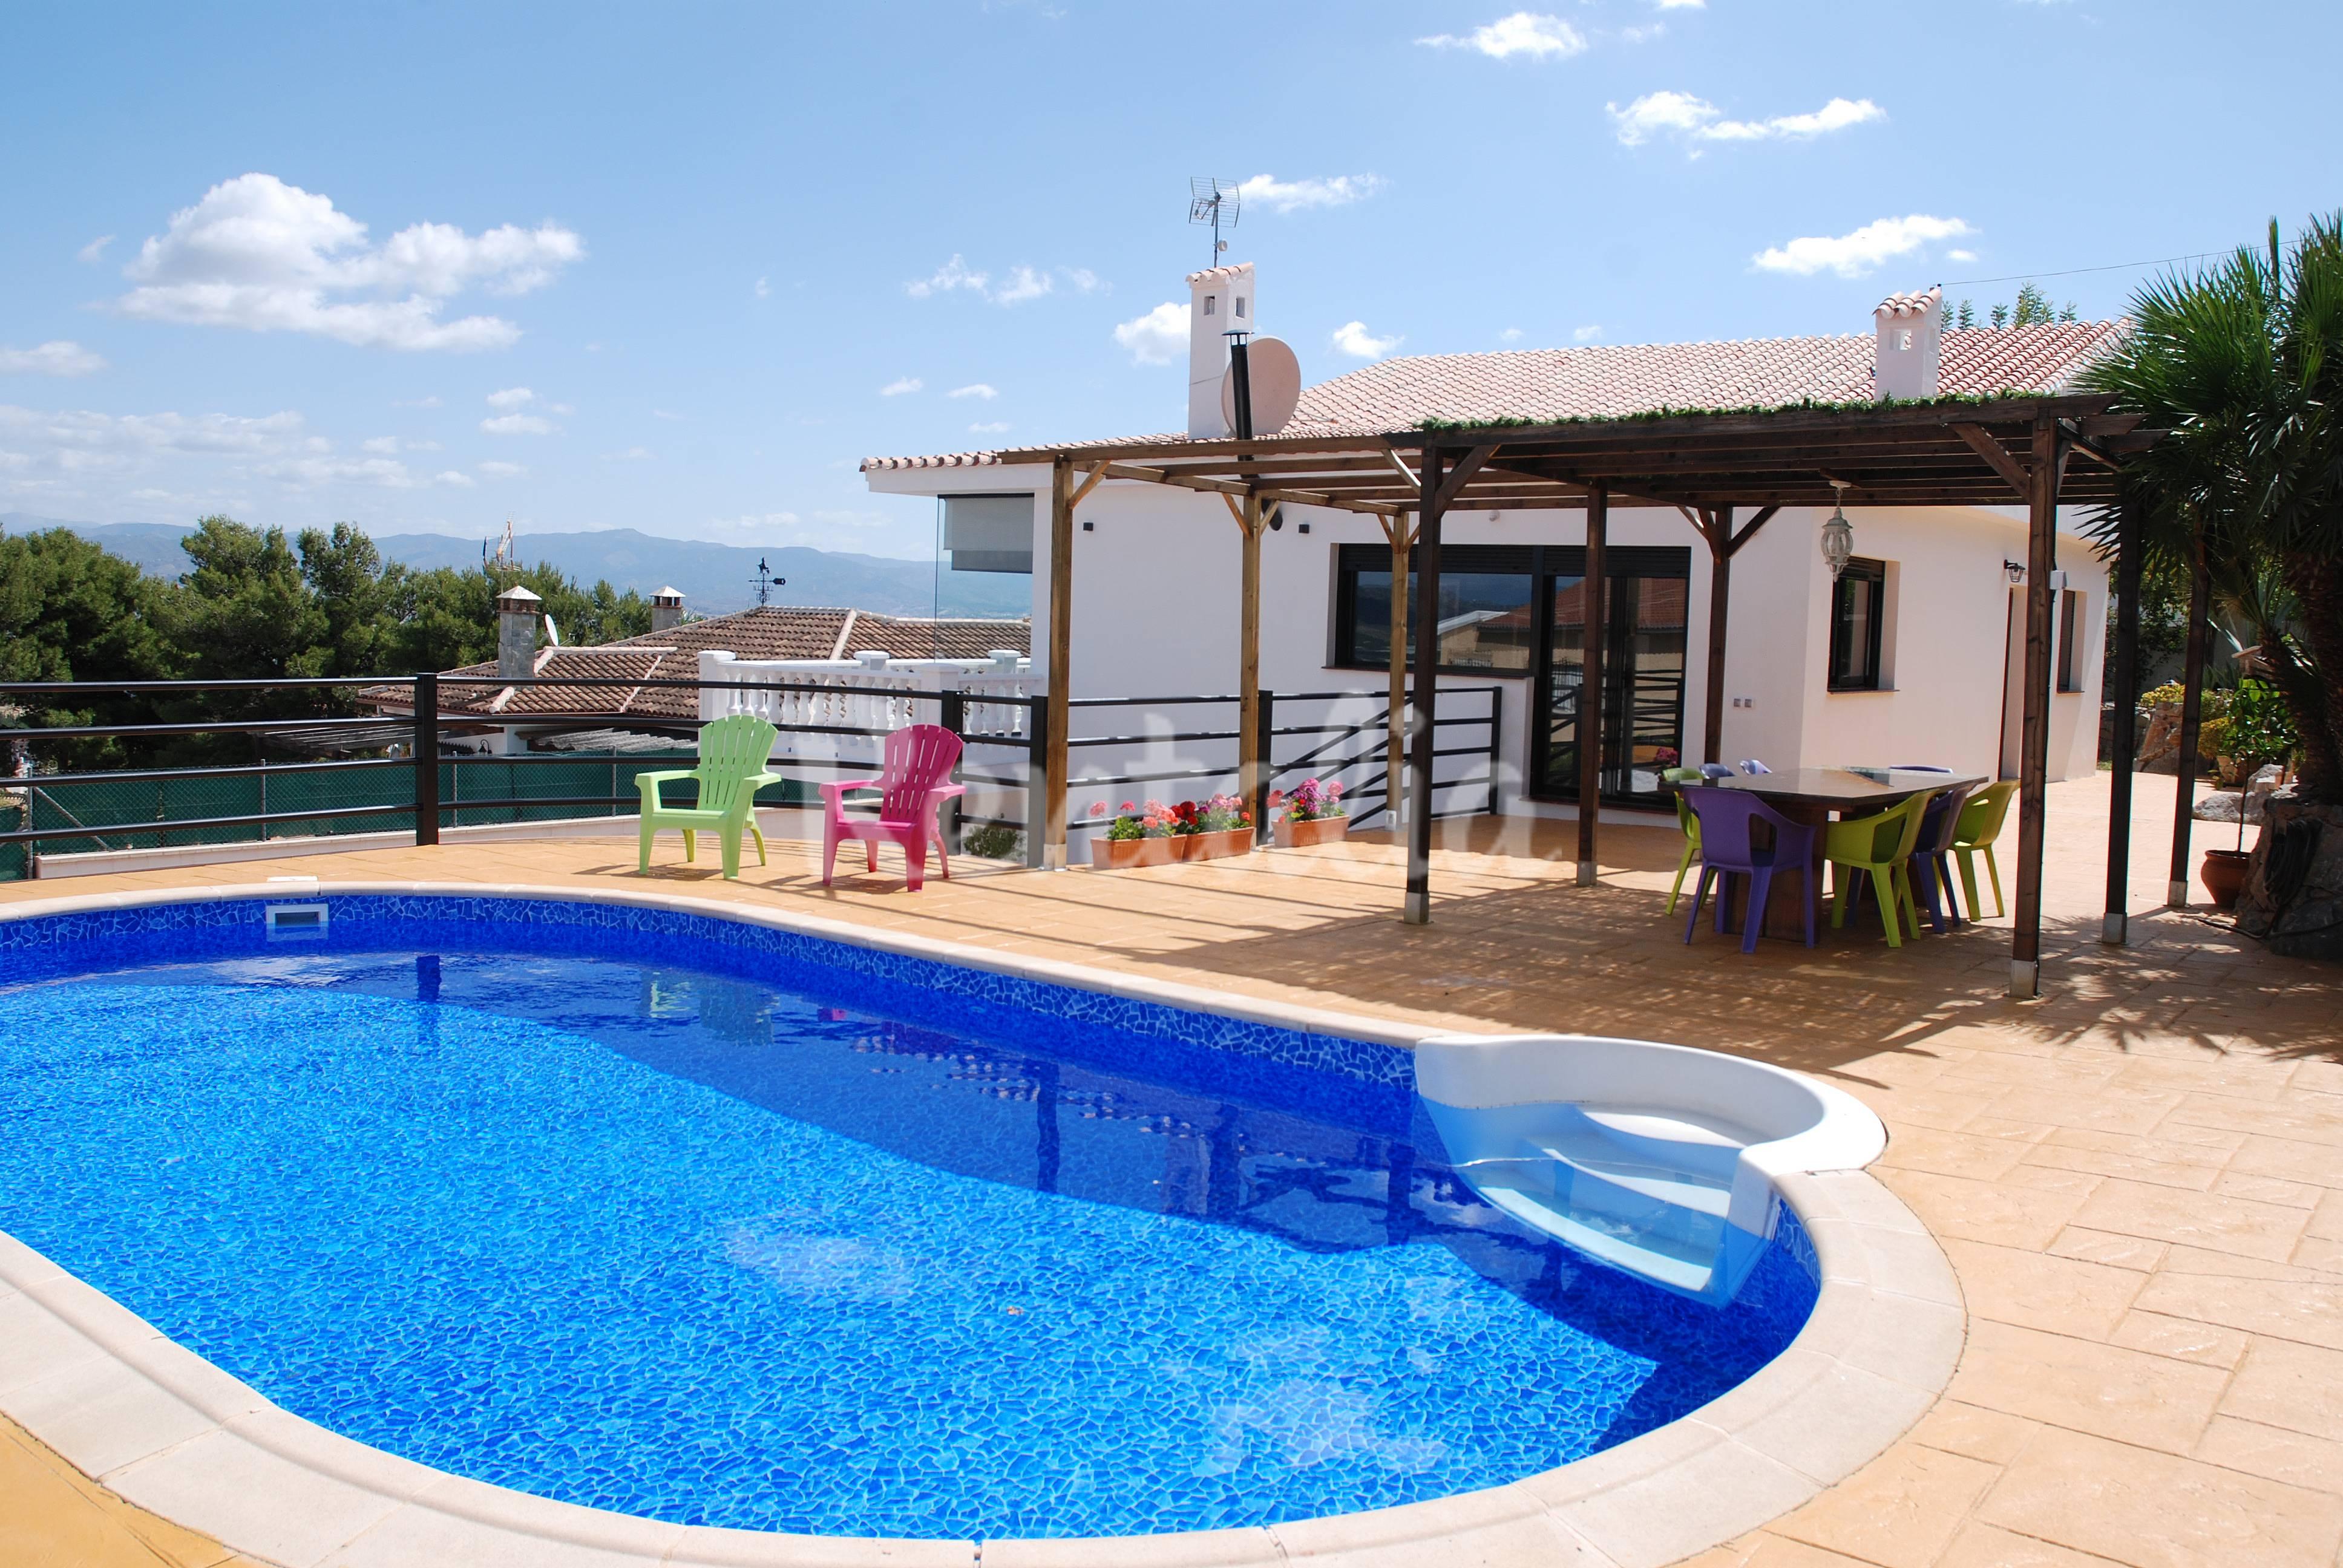 Villa en m laga piscina privada cerca a la playa for Piscina publica malaga